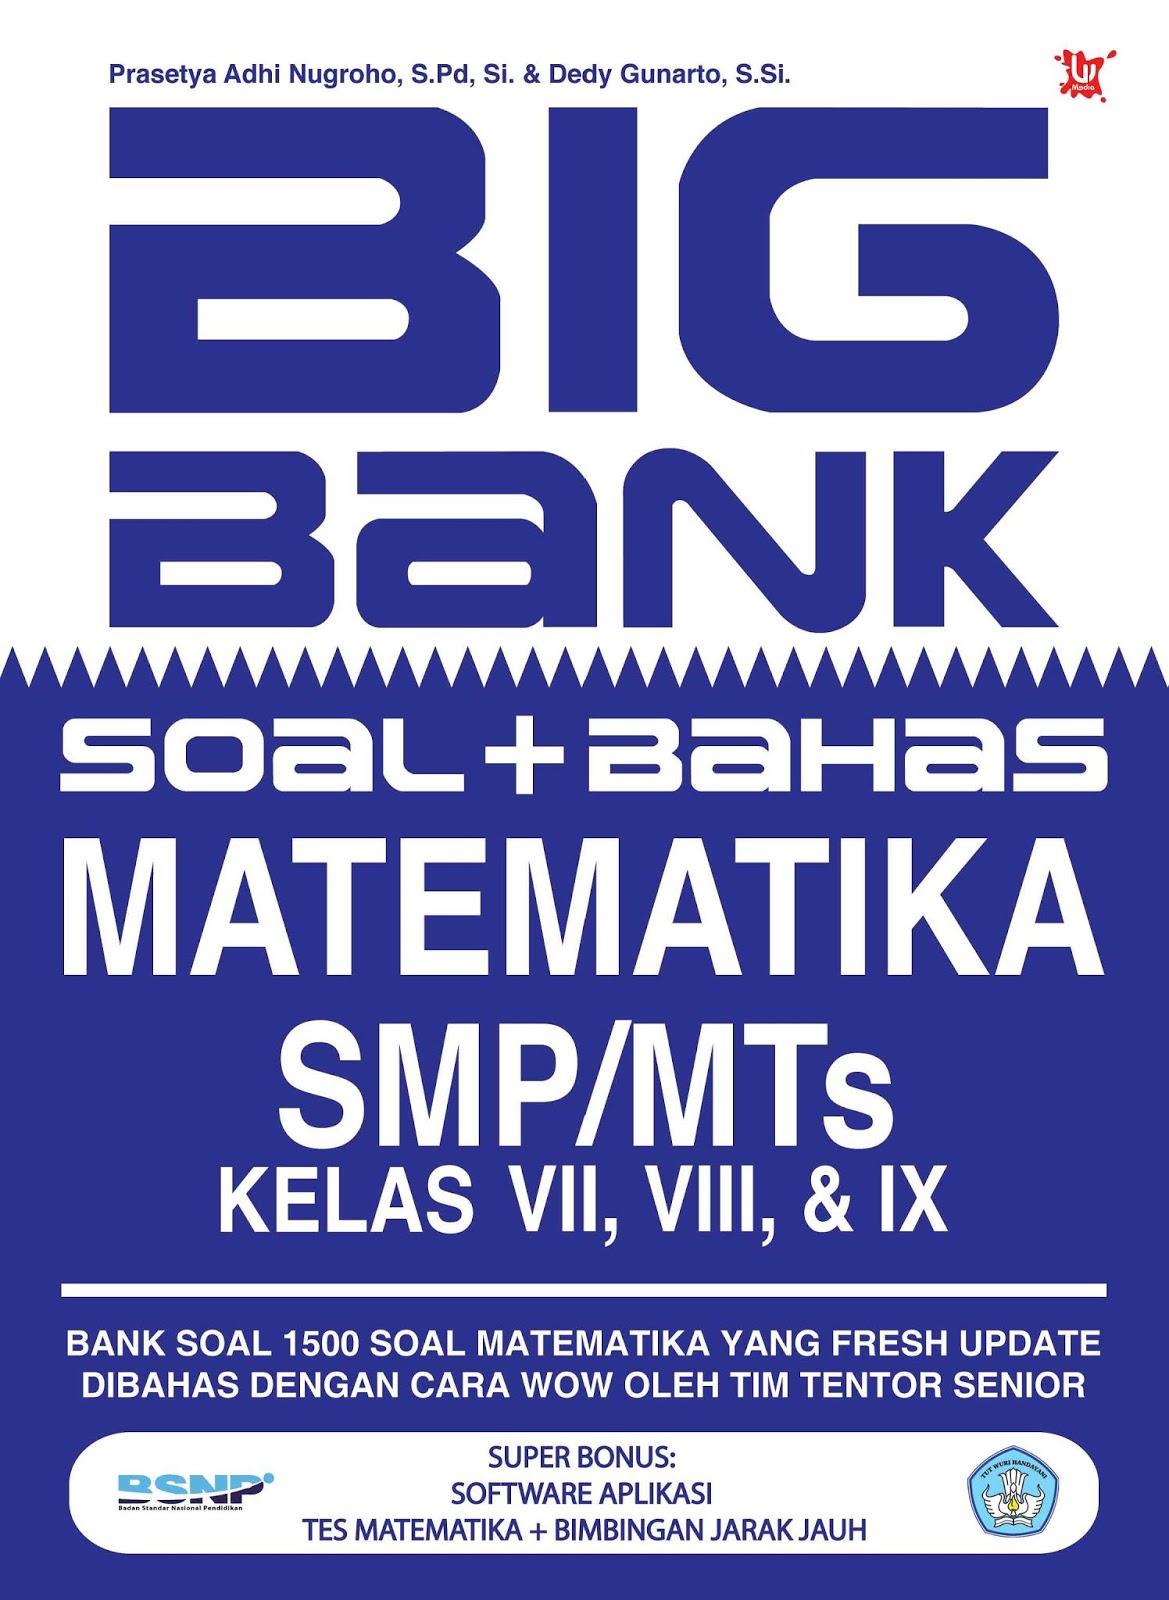 Big Bank Soal dan Bahas Matematika SMP/Mts Kelas VII, VIII dan IX